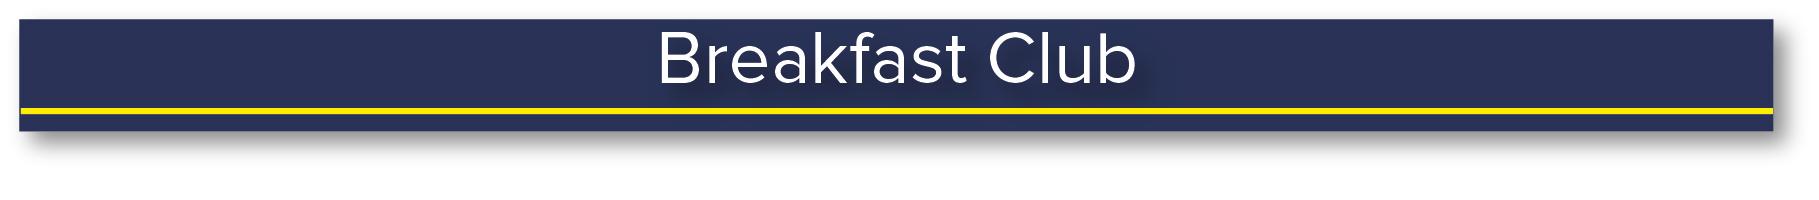 Breakfast Club heading.jpg